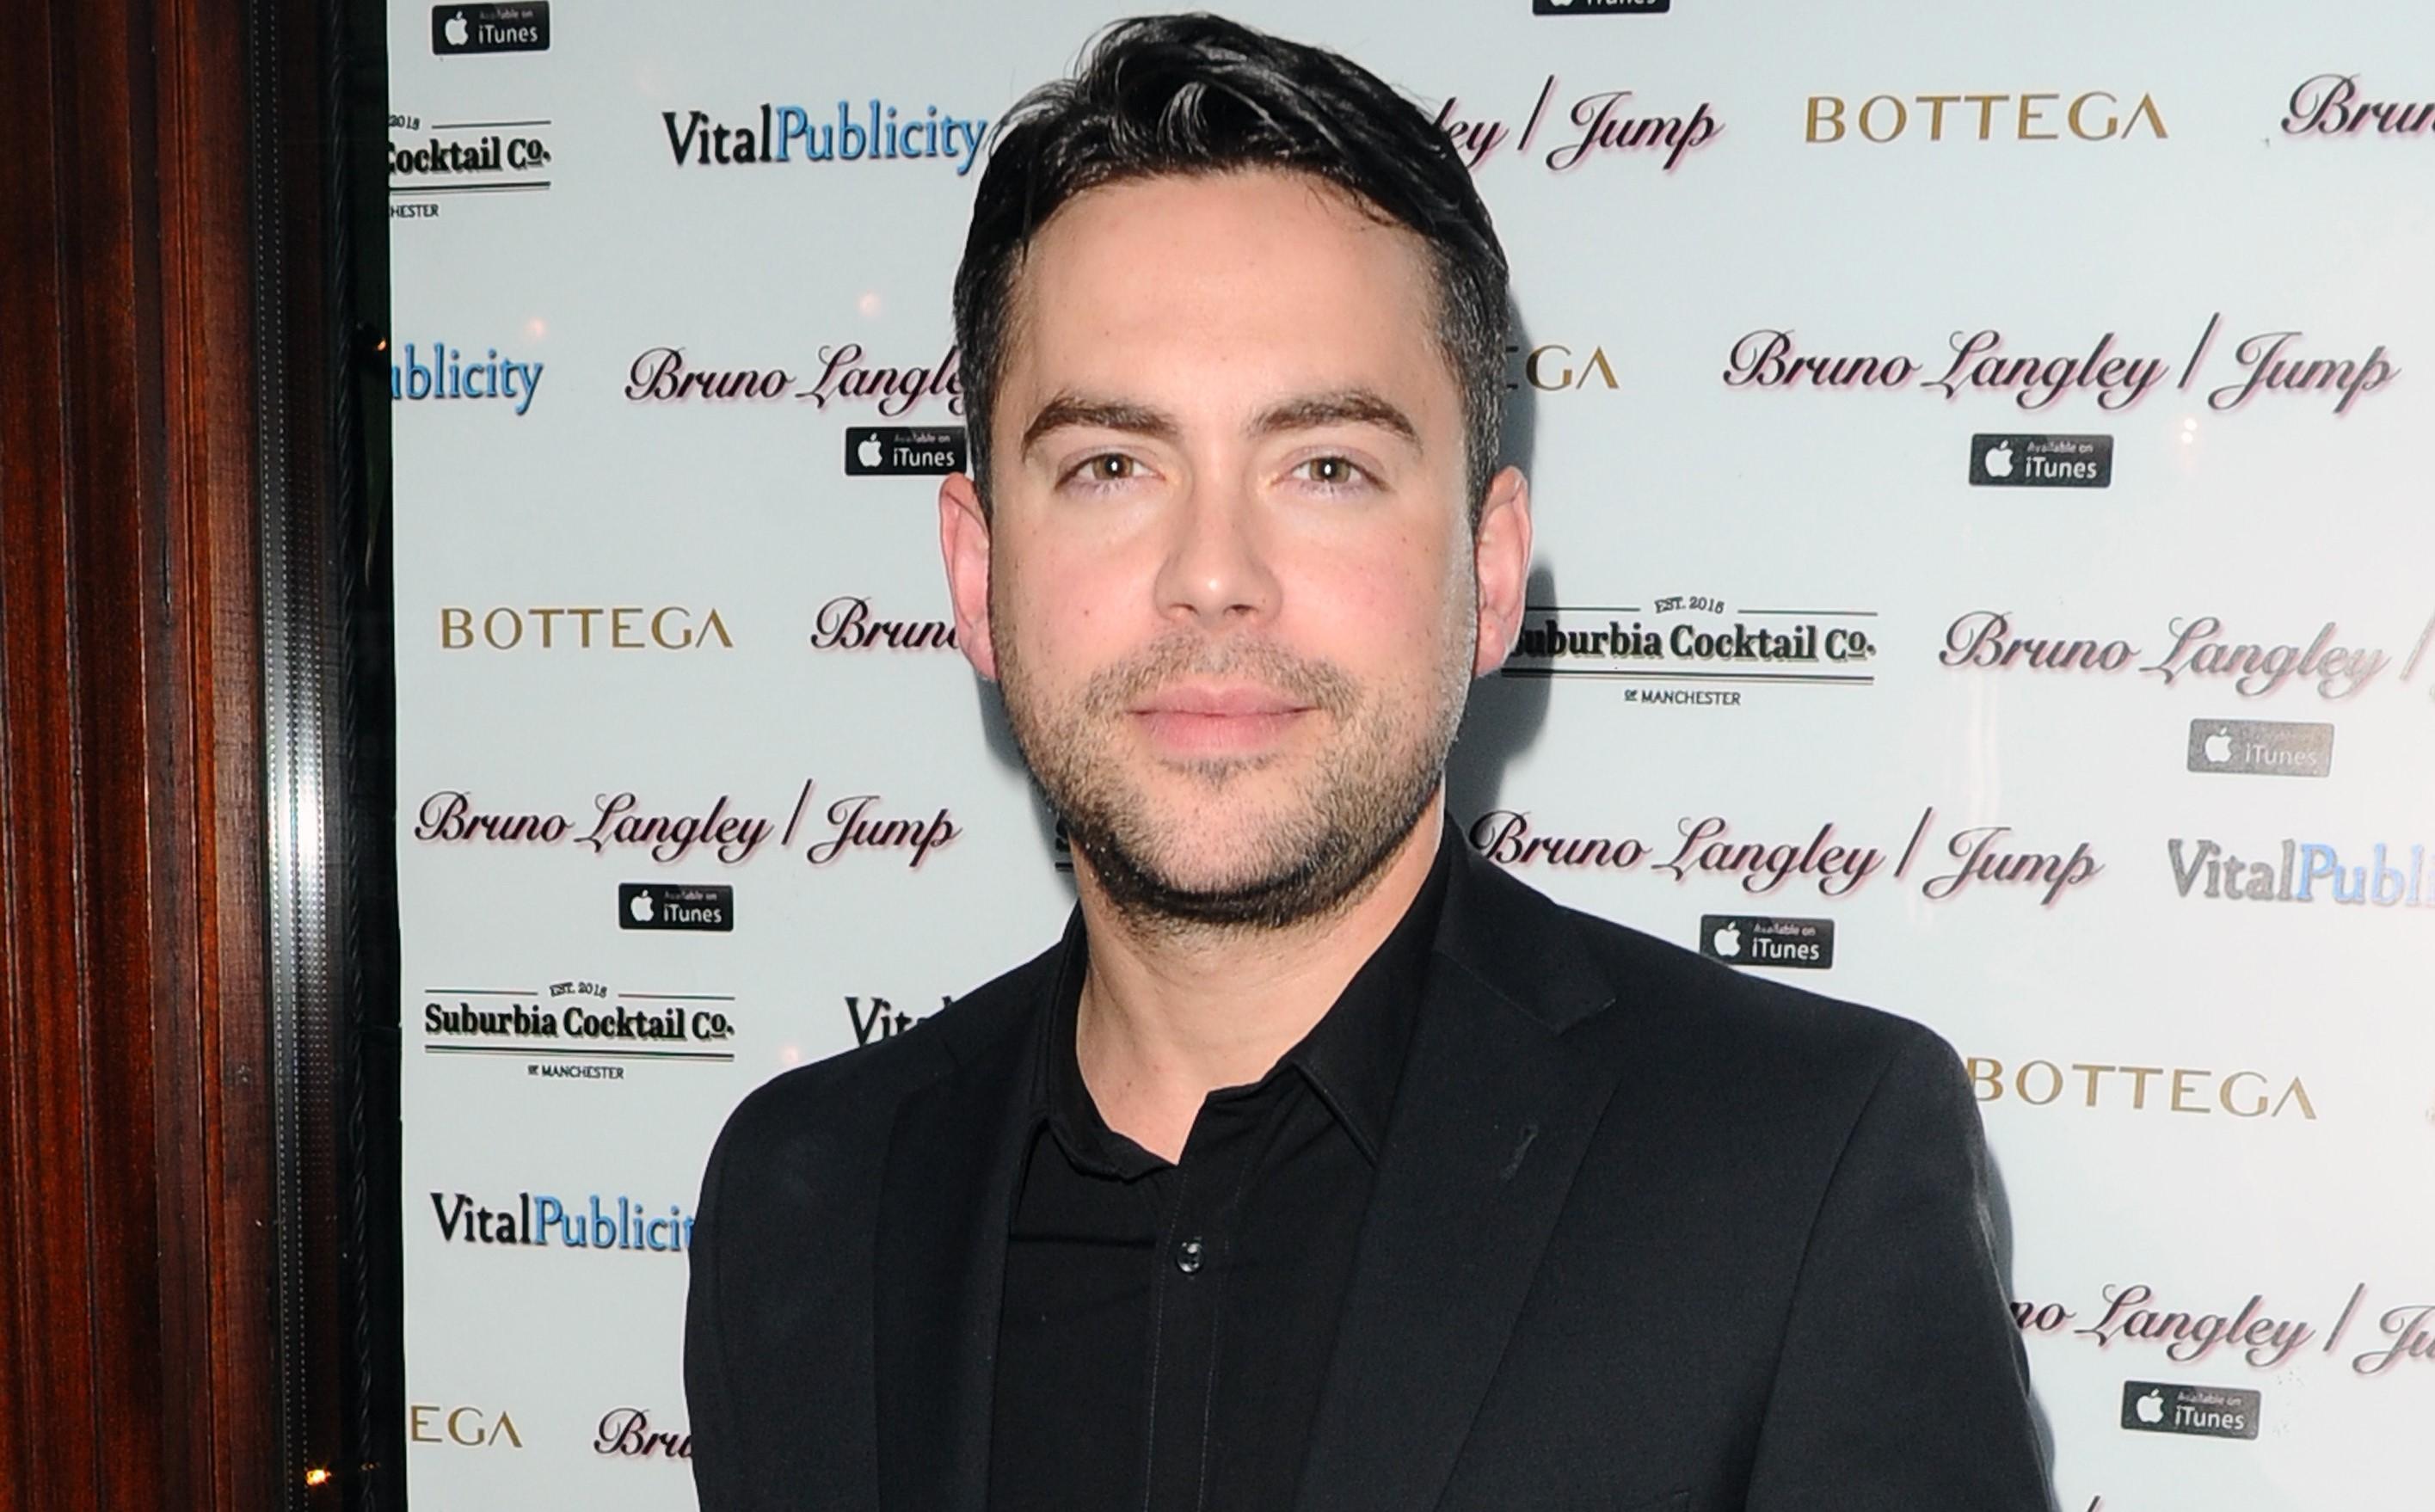 Former Coronation Street star Bruno Langley responds to negative reports